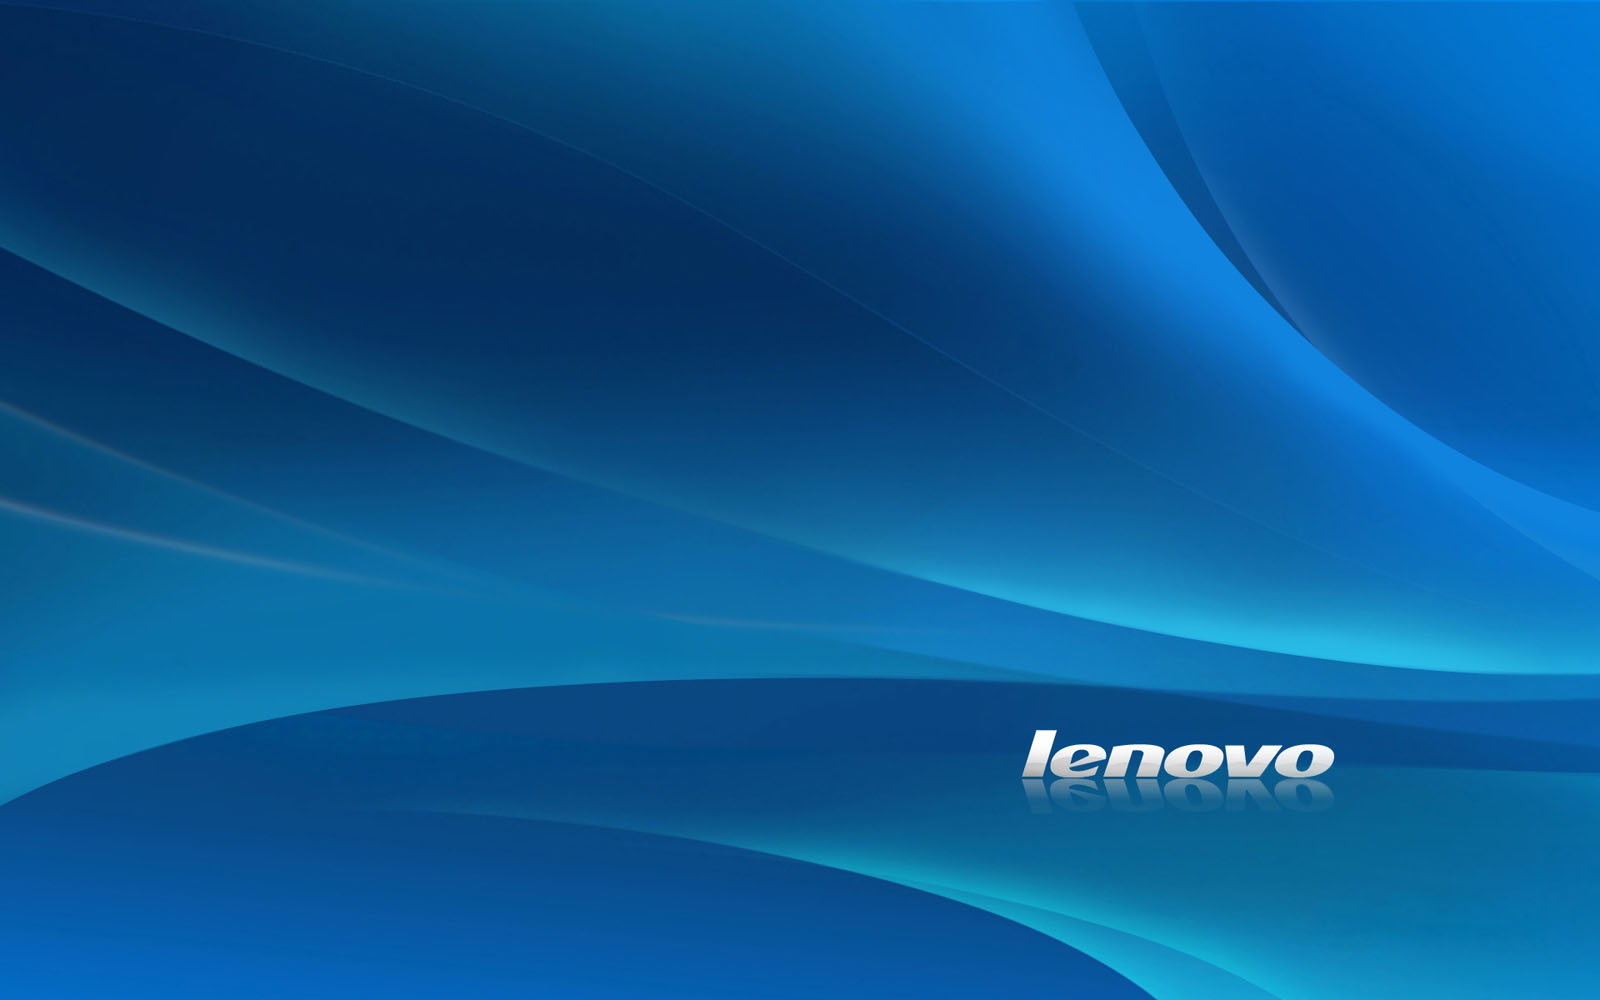 Lenovo Wallpaper Car: Wallpapers: Lenovo Laptop Wallpapers